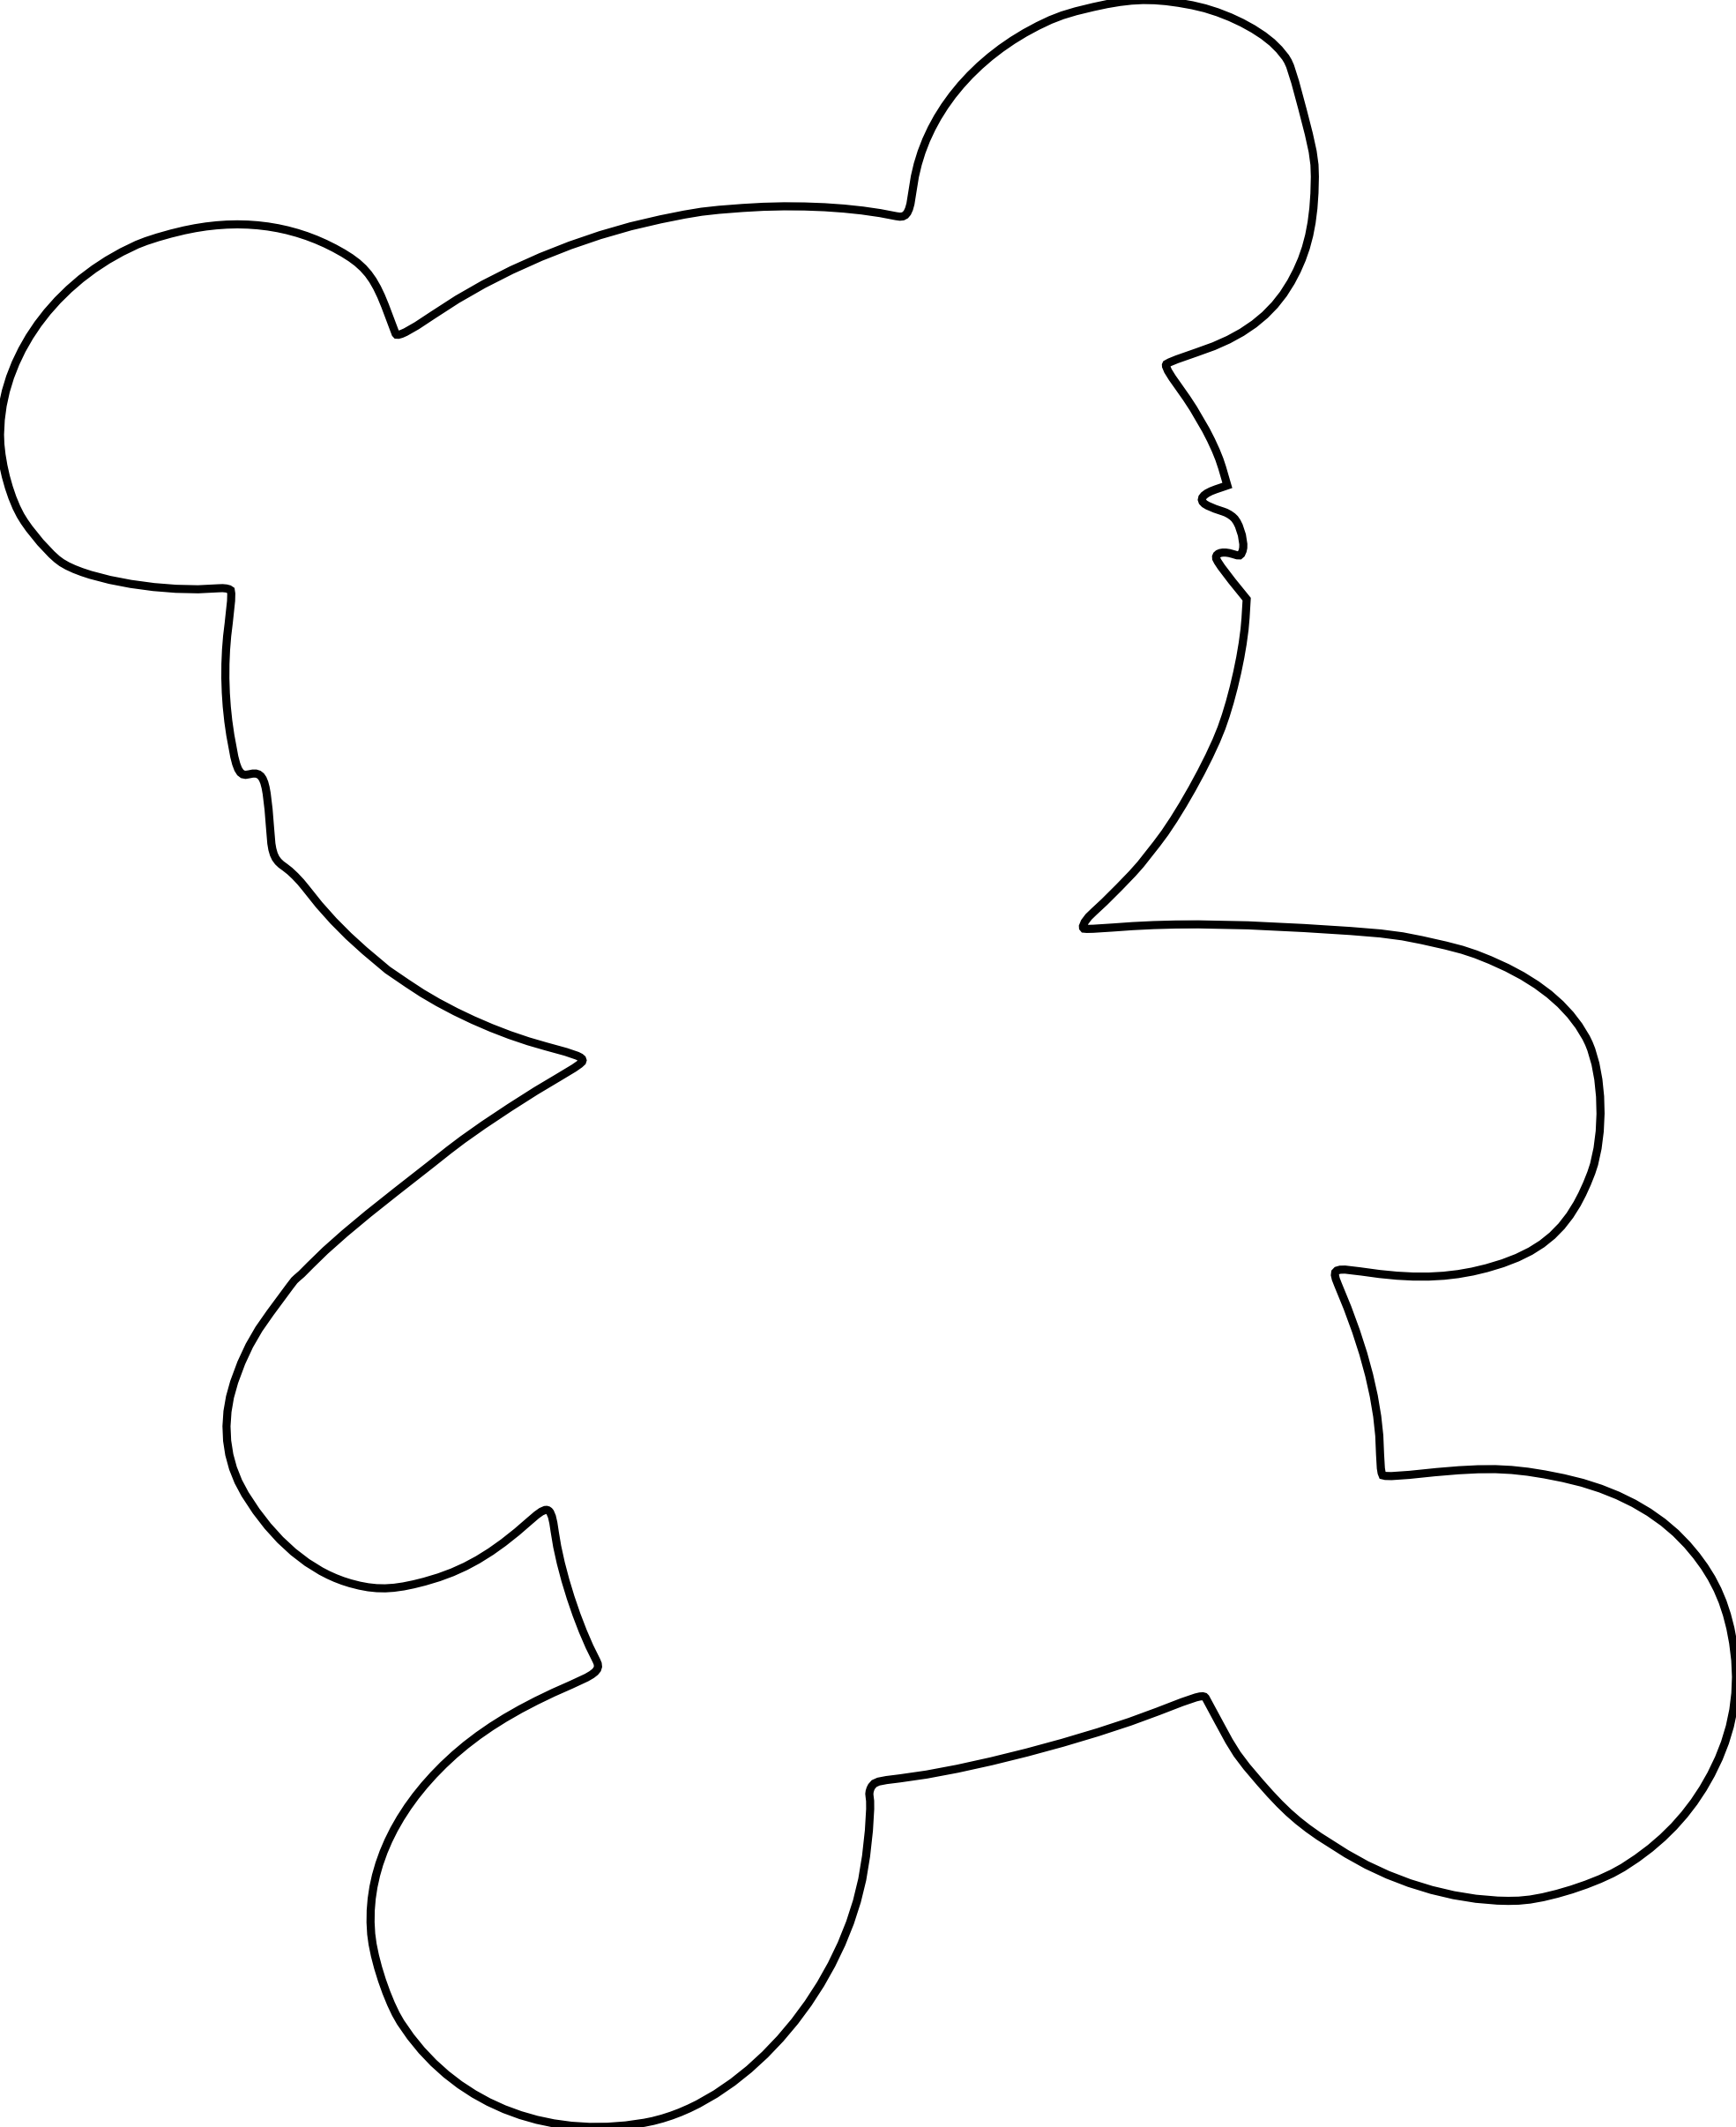 Teddy Bear Drawing Outline #1 | For Them Kids | Pinterest ...